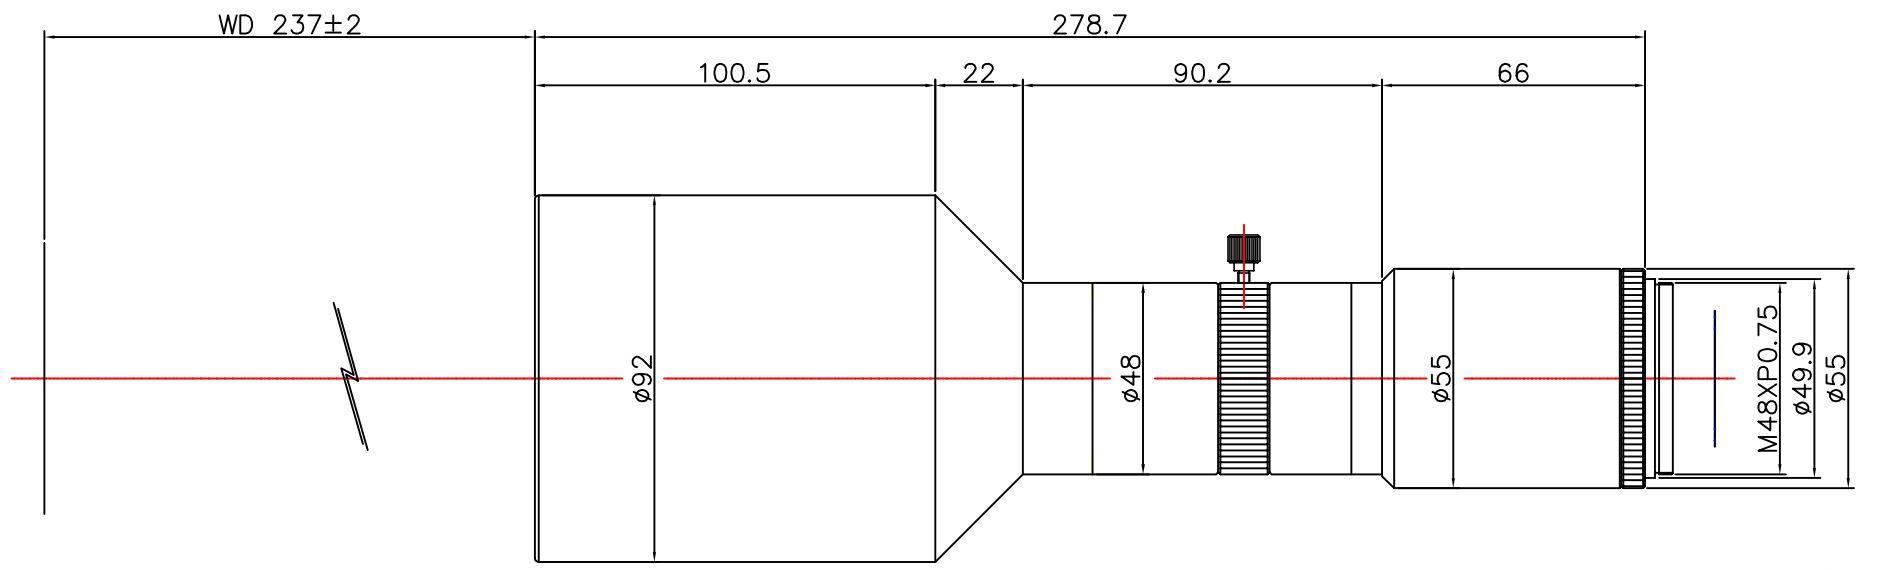 Lensagon T25M-05-237I